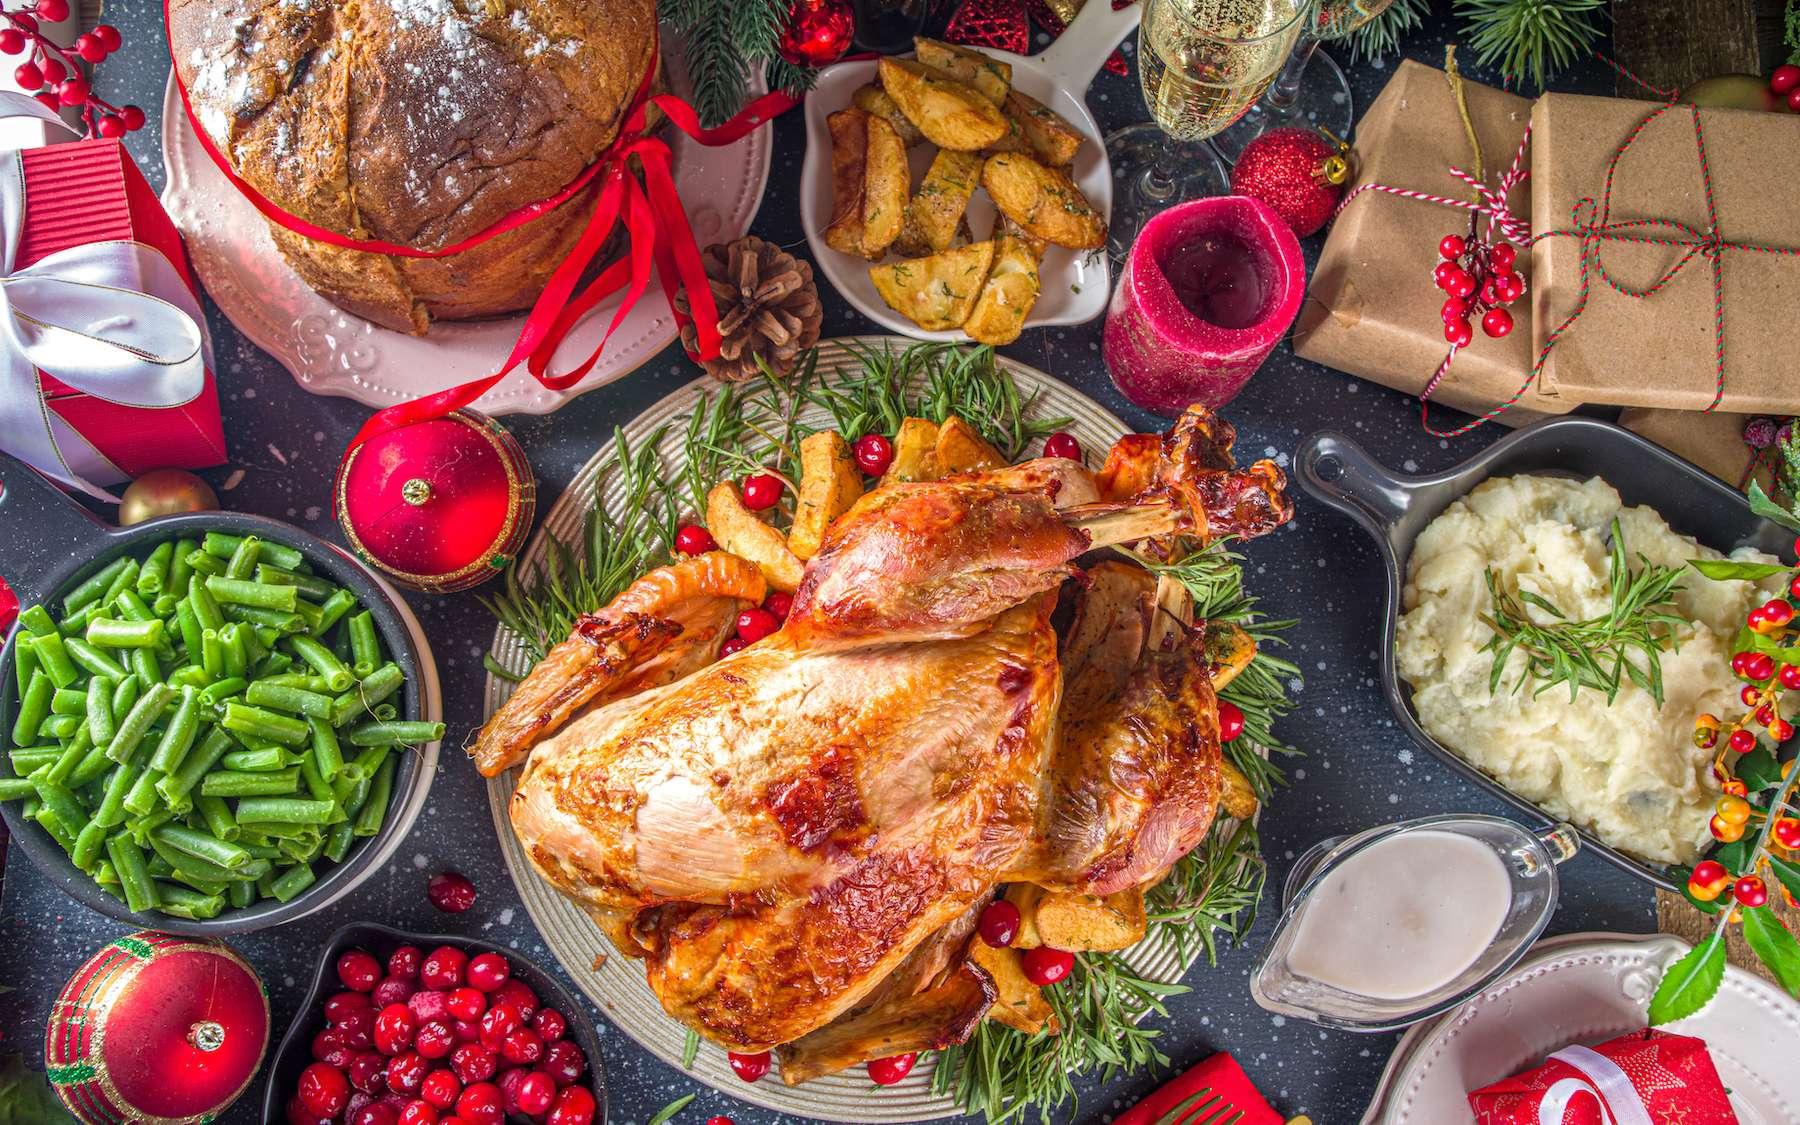 Viande, poisson, fruits et légumes : que savourer en novembre ? © ricka_kinamoto, Adobe Stock